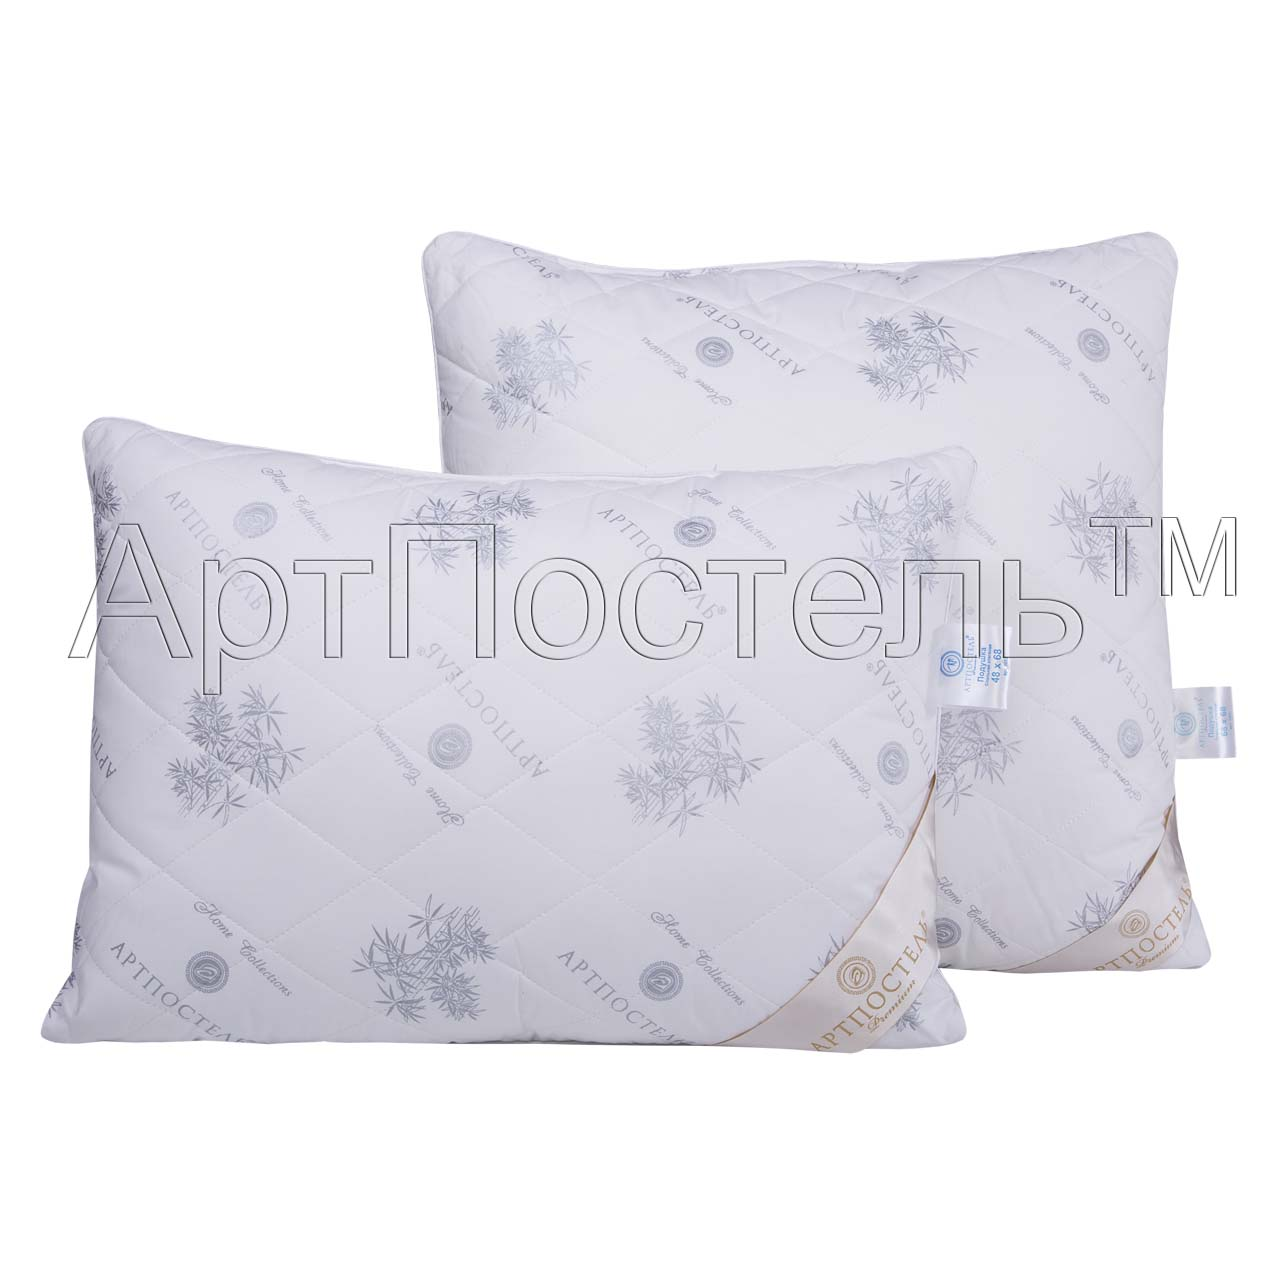 Подушка Панкрациум (бамбук, тик) (40*60) подушка лето осень бамбук лузга тик 40 40